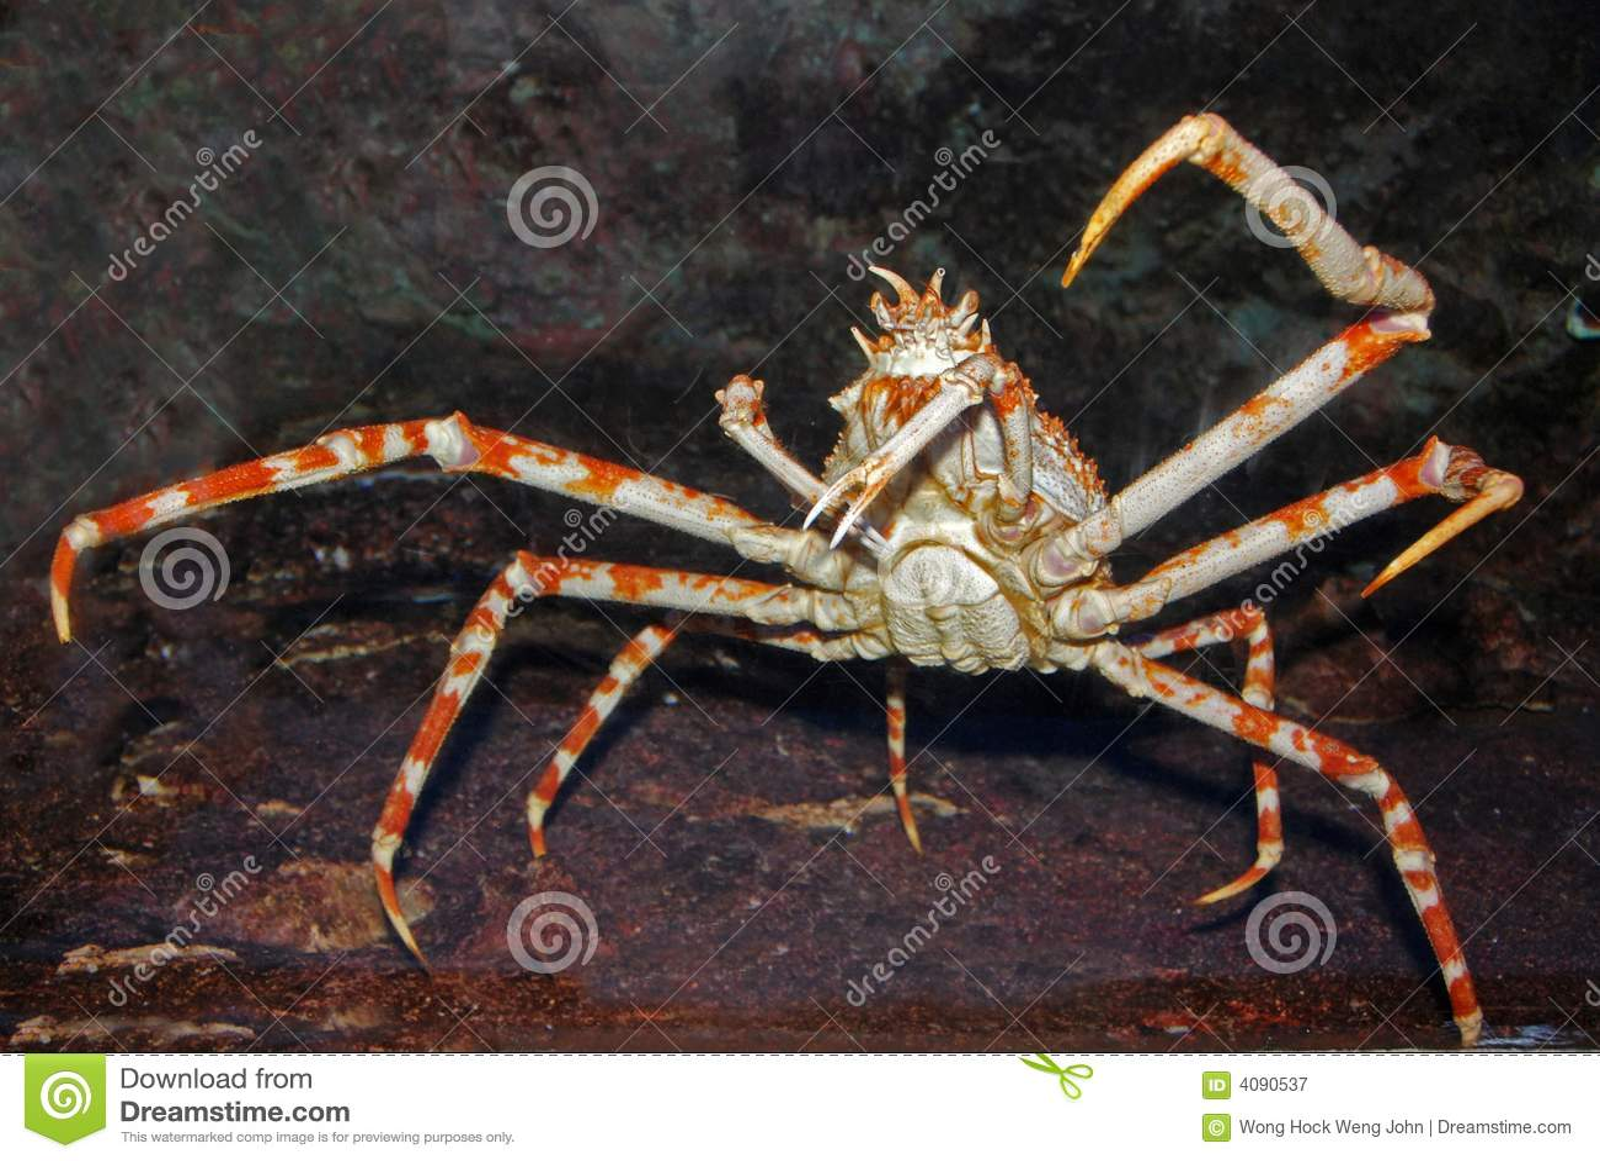 Krab w akwarium pająk